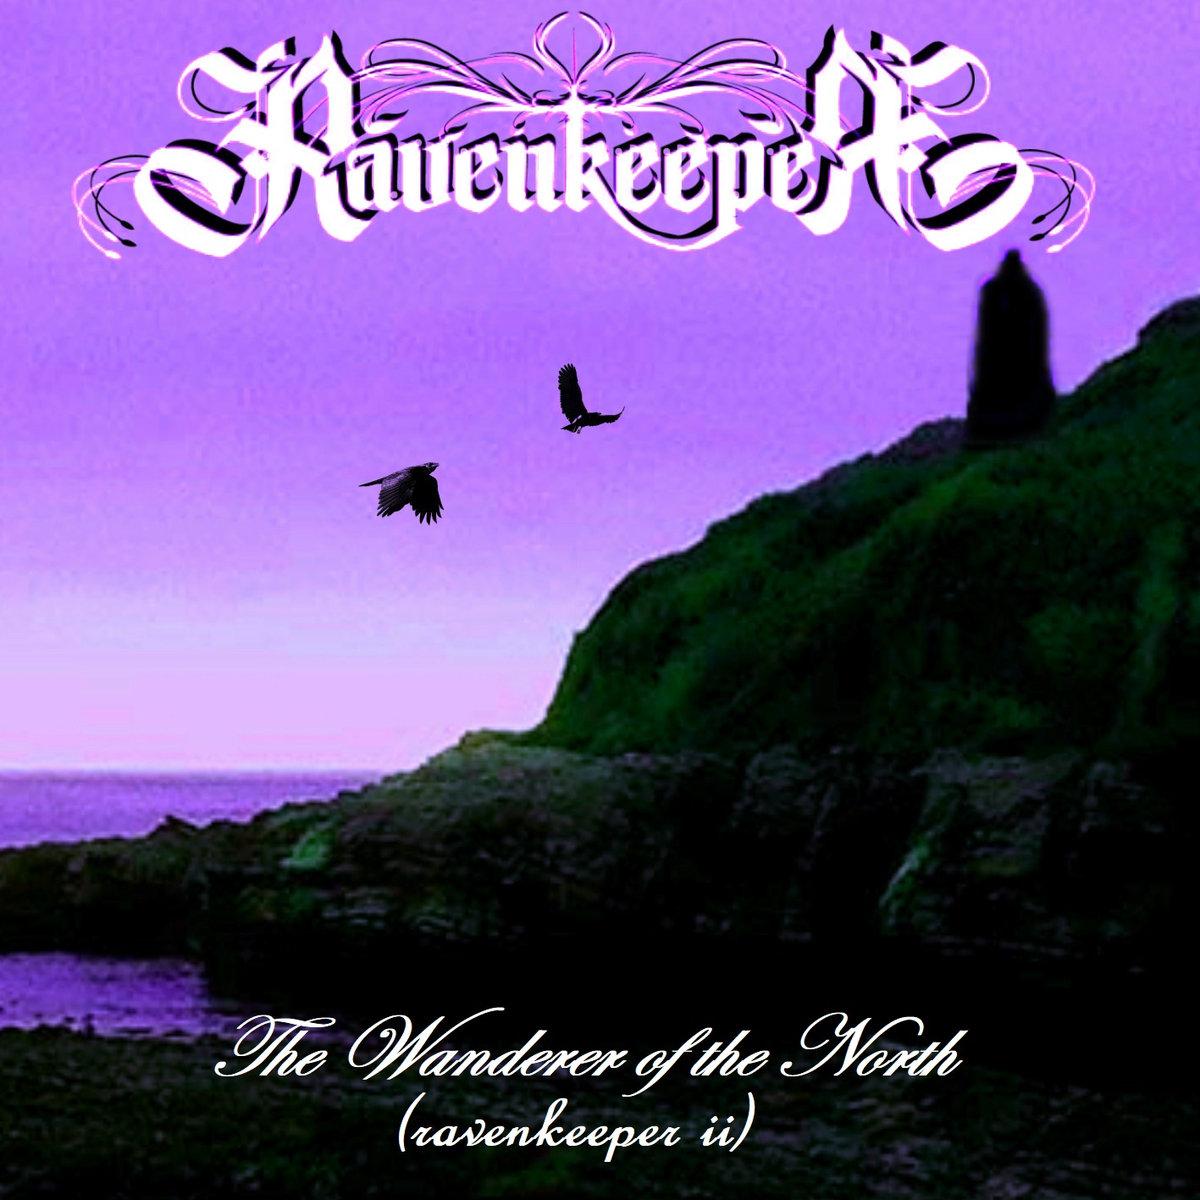 The Wanderer Of The North (Ravenkeeper Ii)